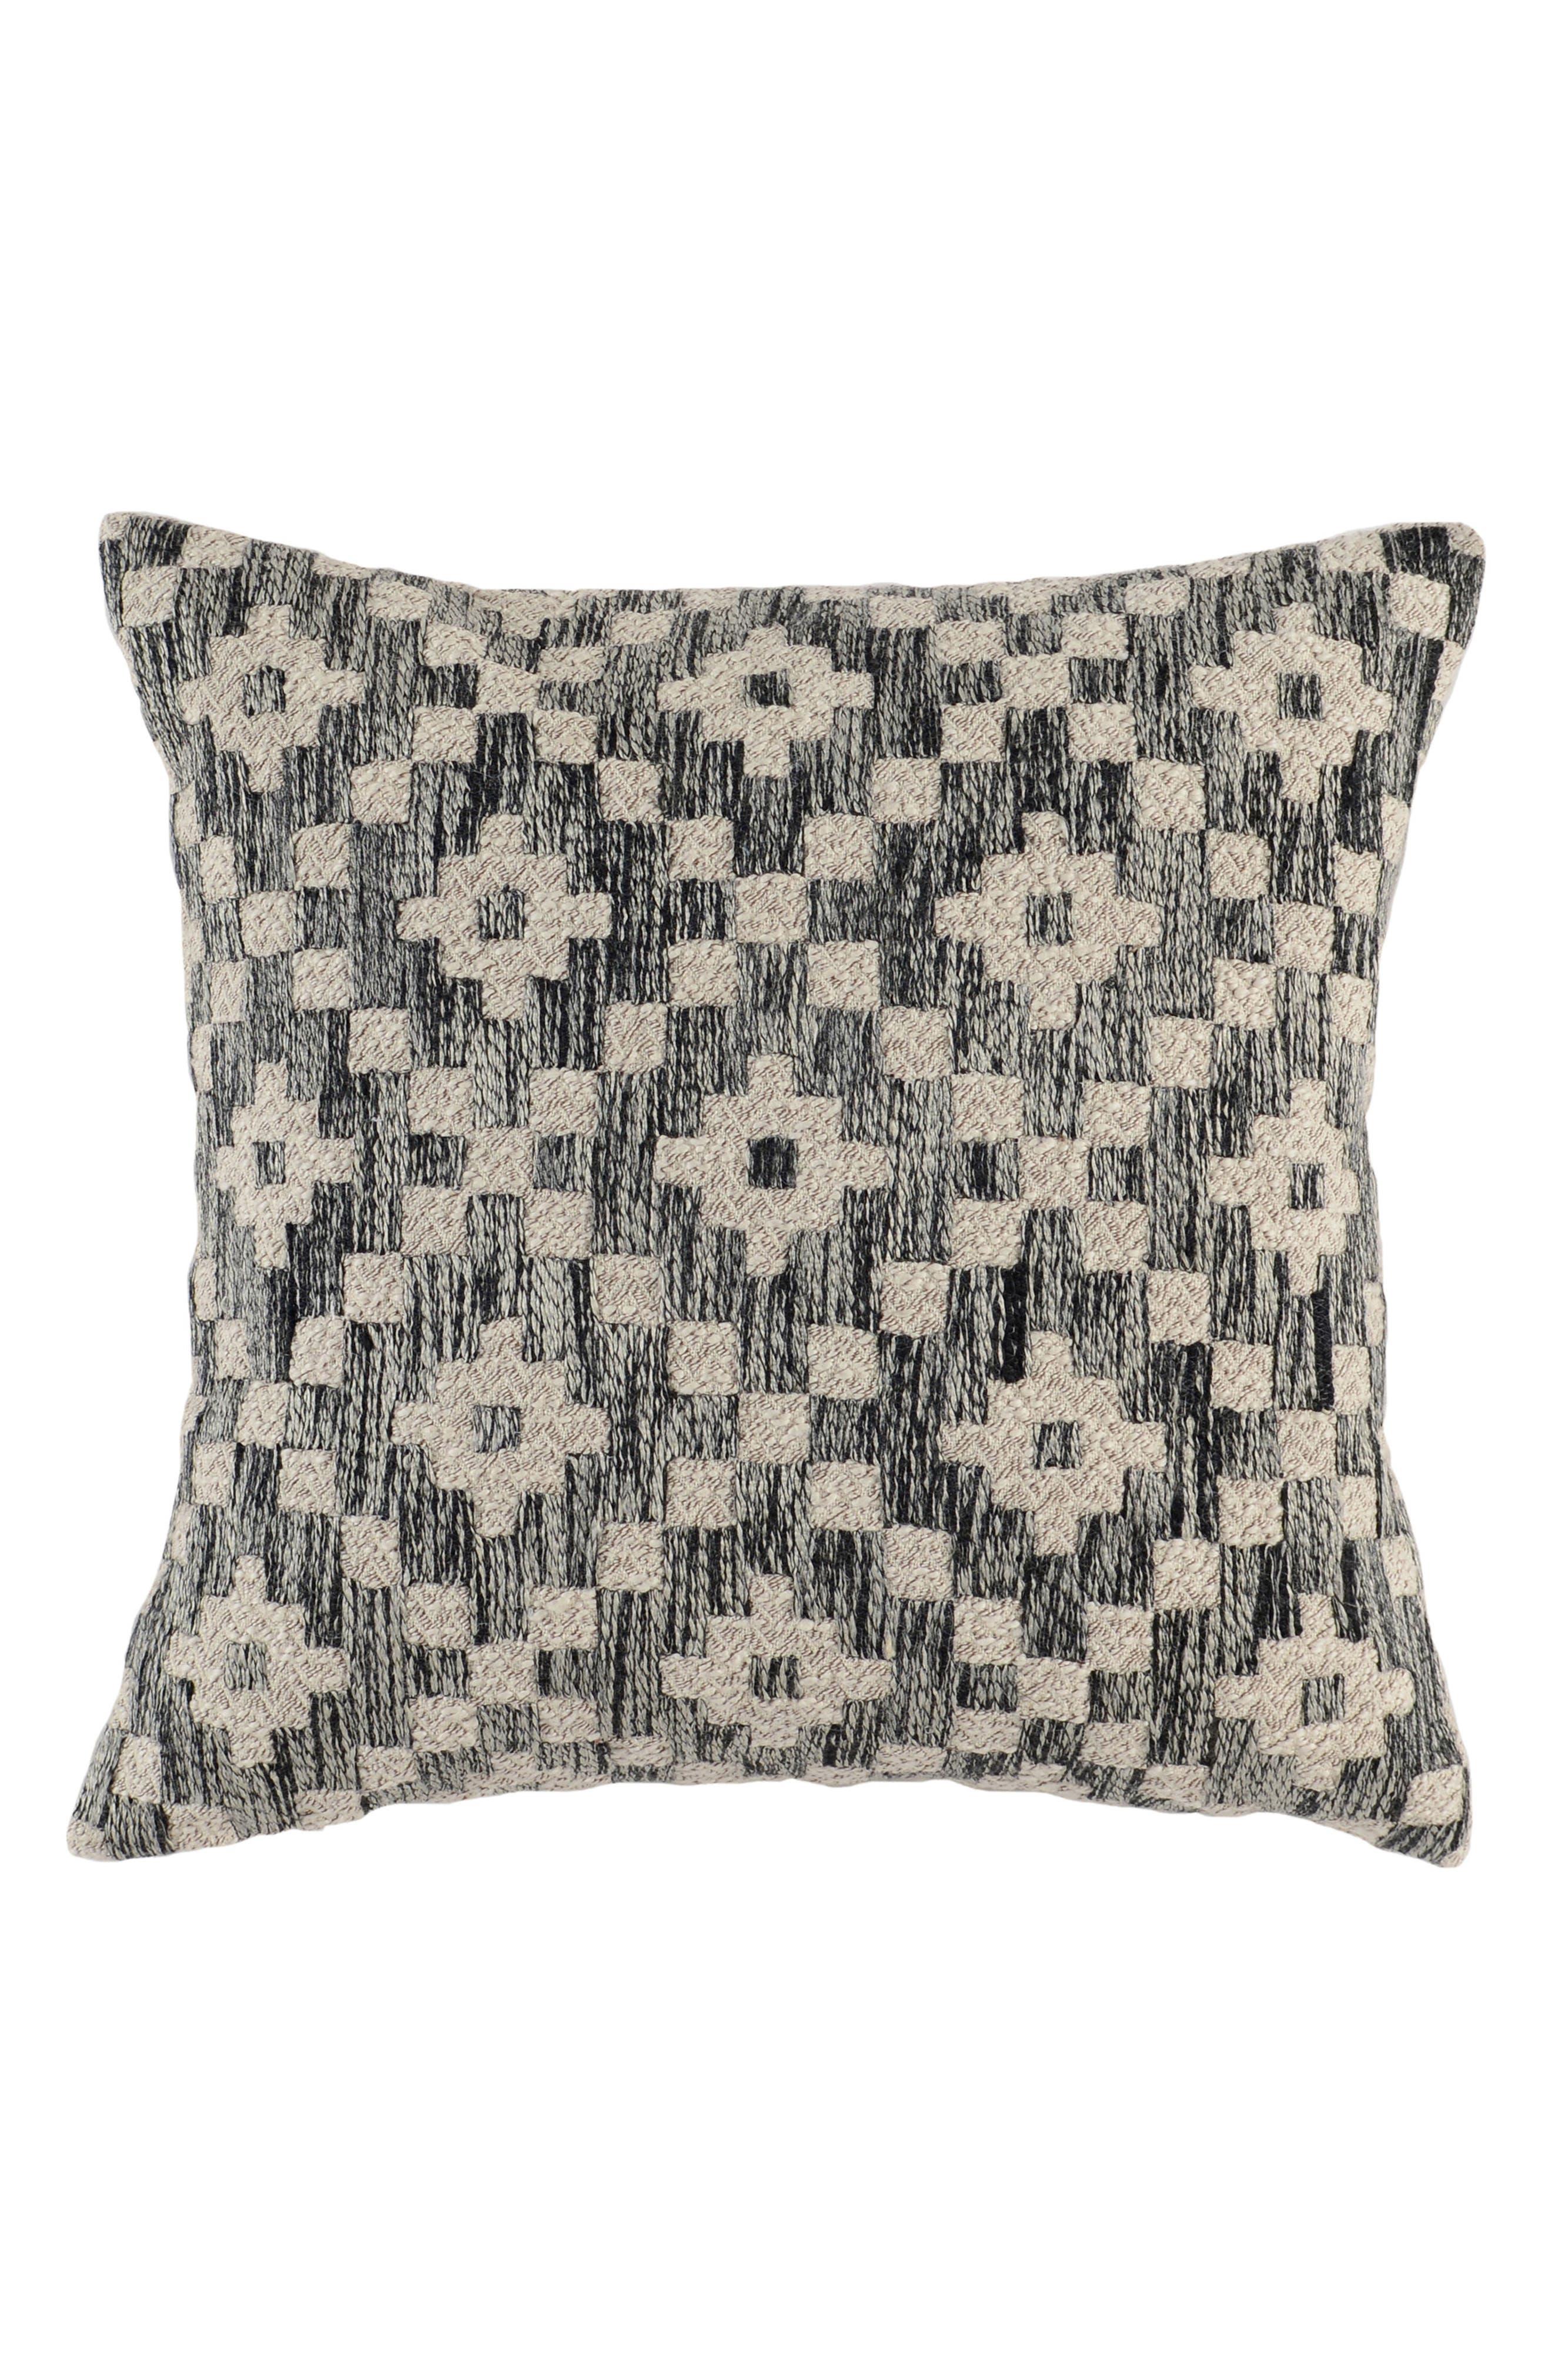 Perot Accent Pillow,                             Main thumbnail 1, color,                             001